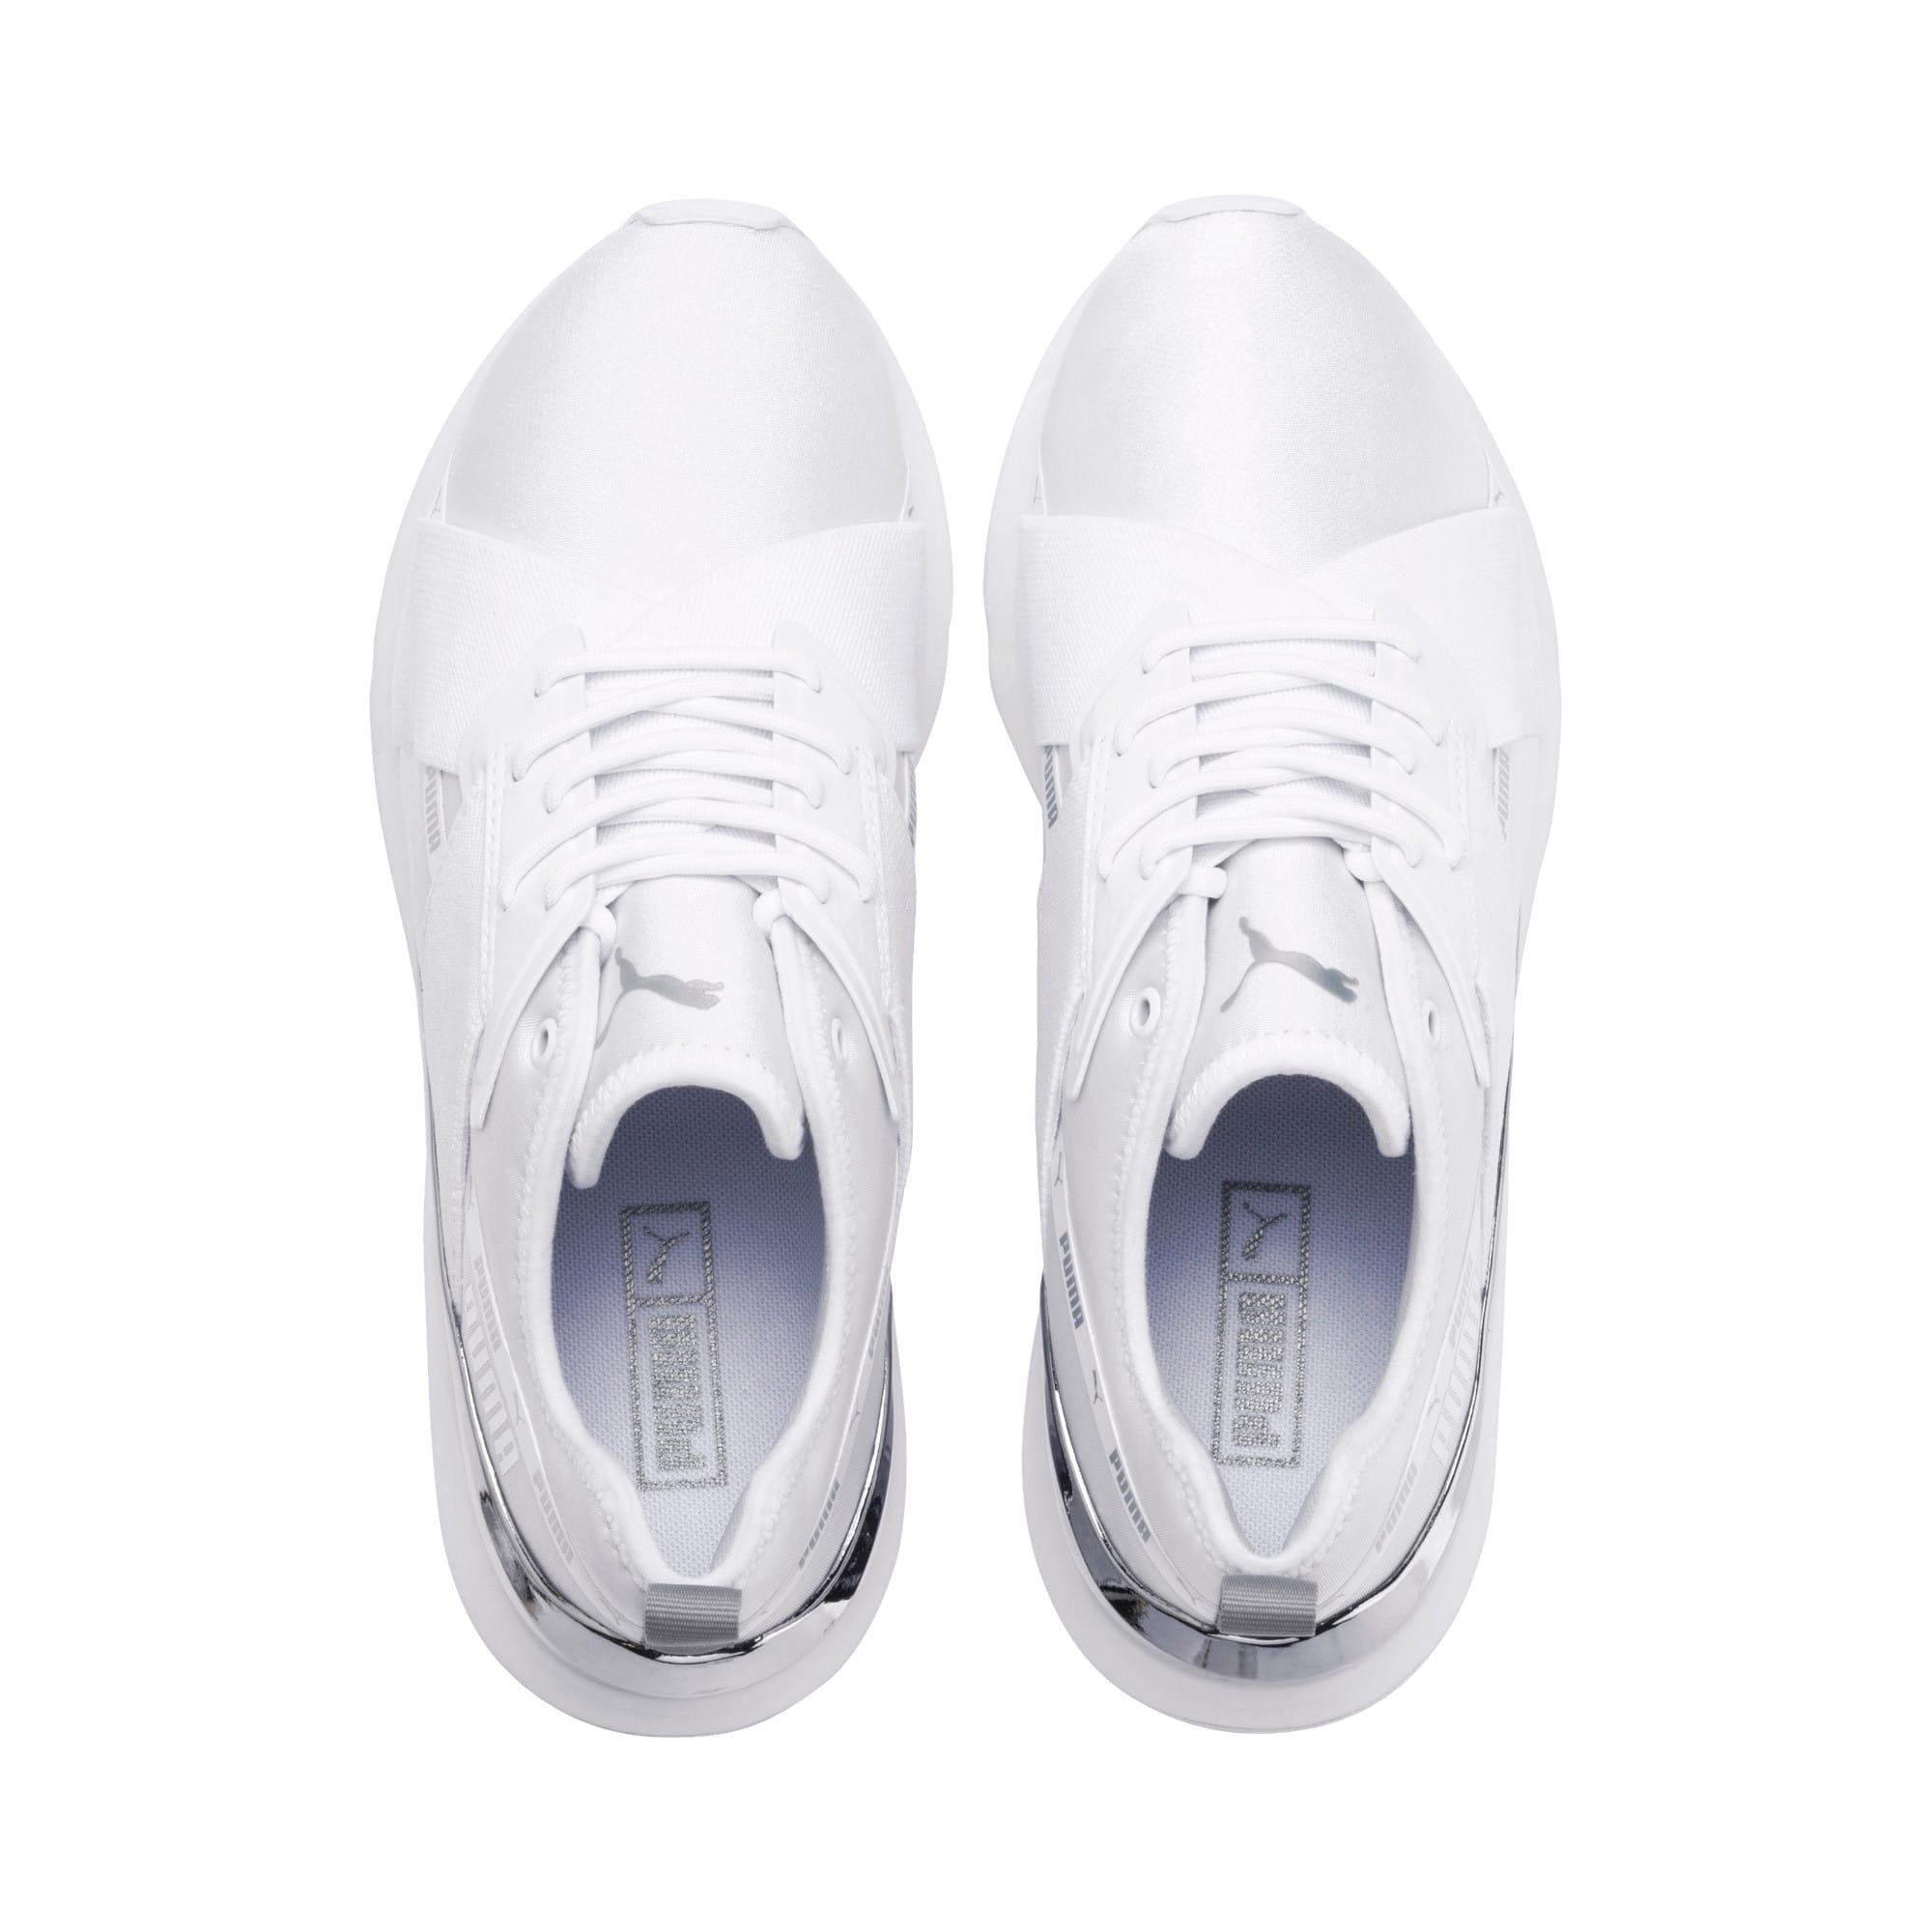 Thumbnail 7 of Muse X-2 Metallic Women's Sneakers, Puma White, medium